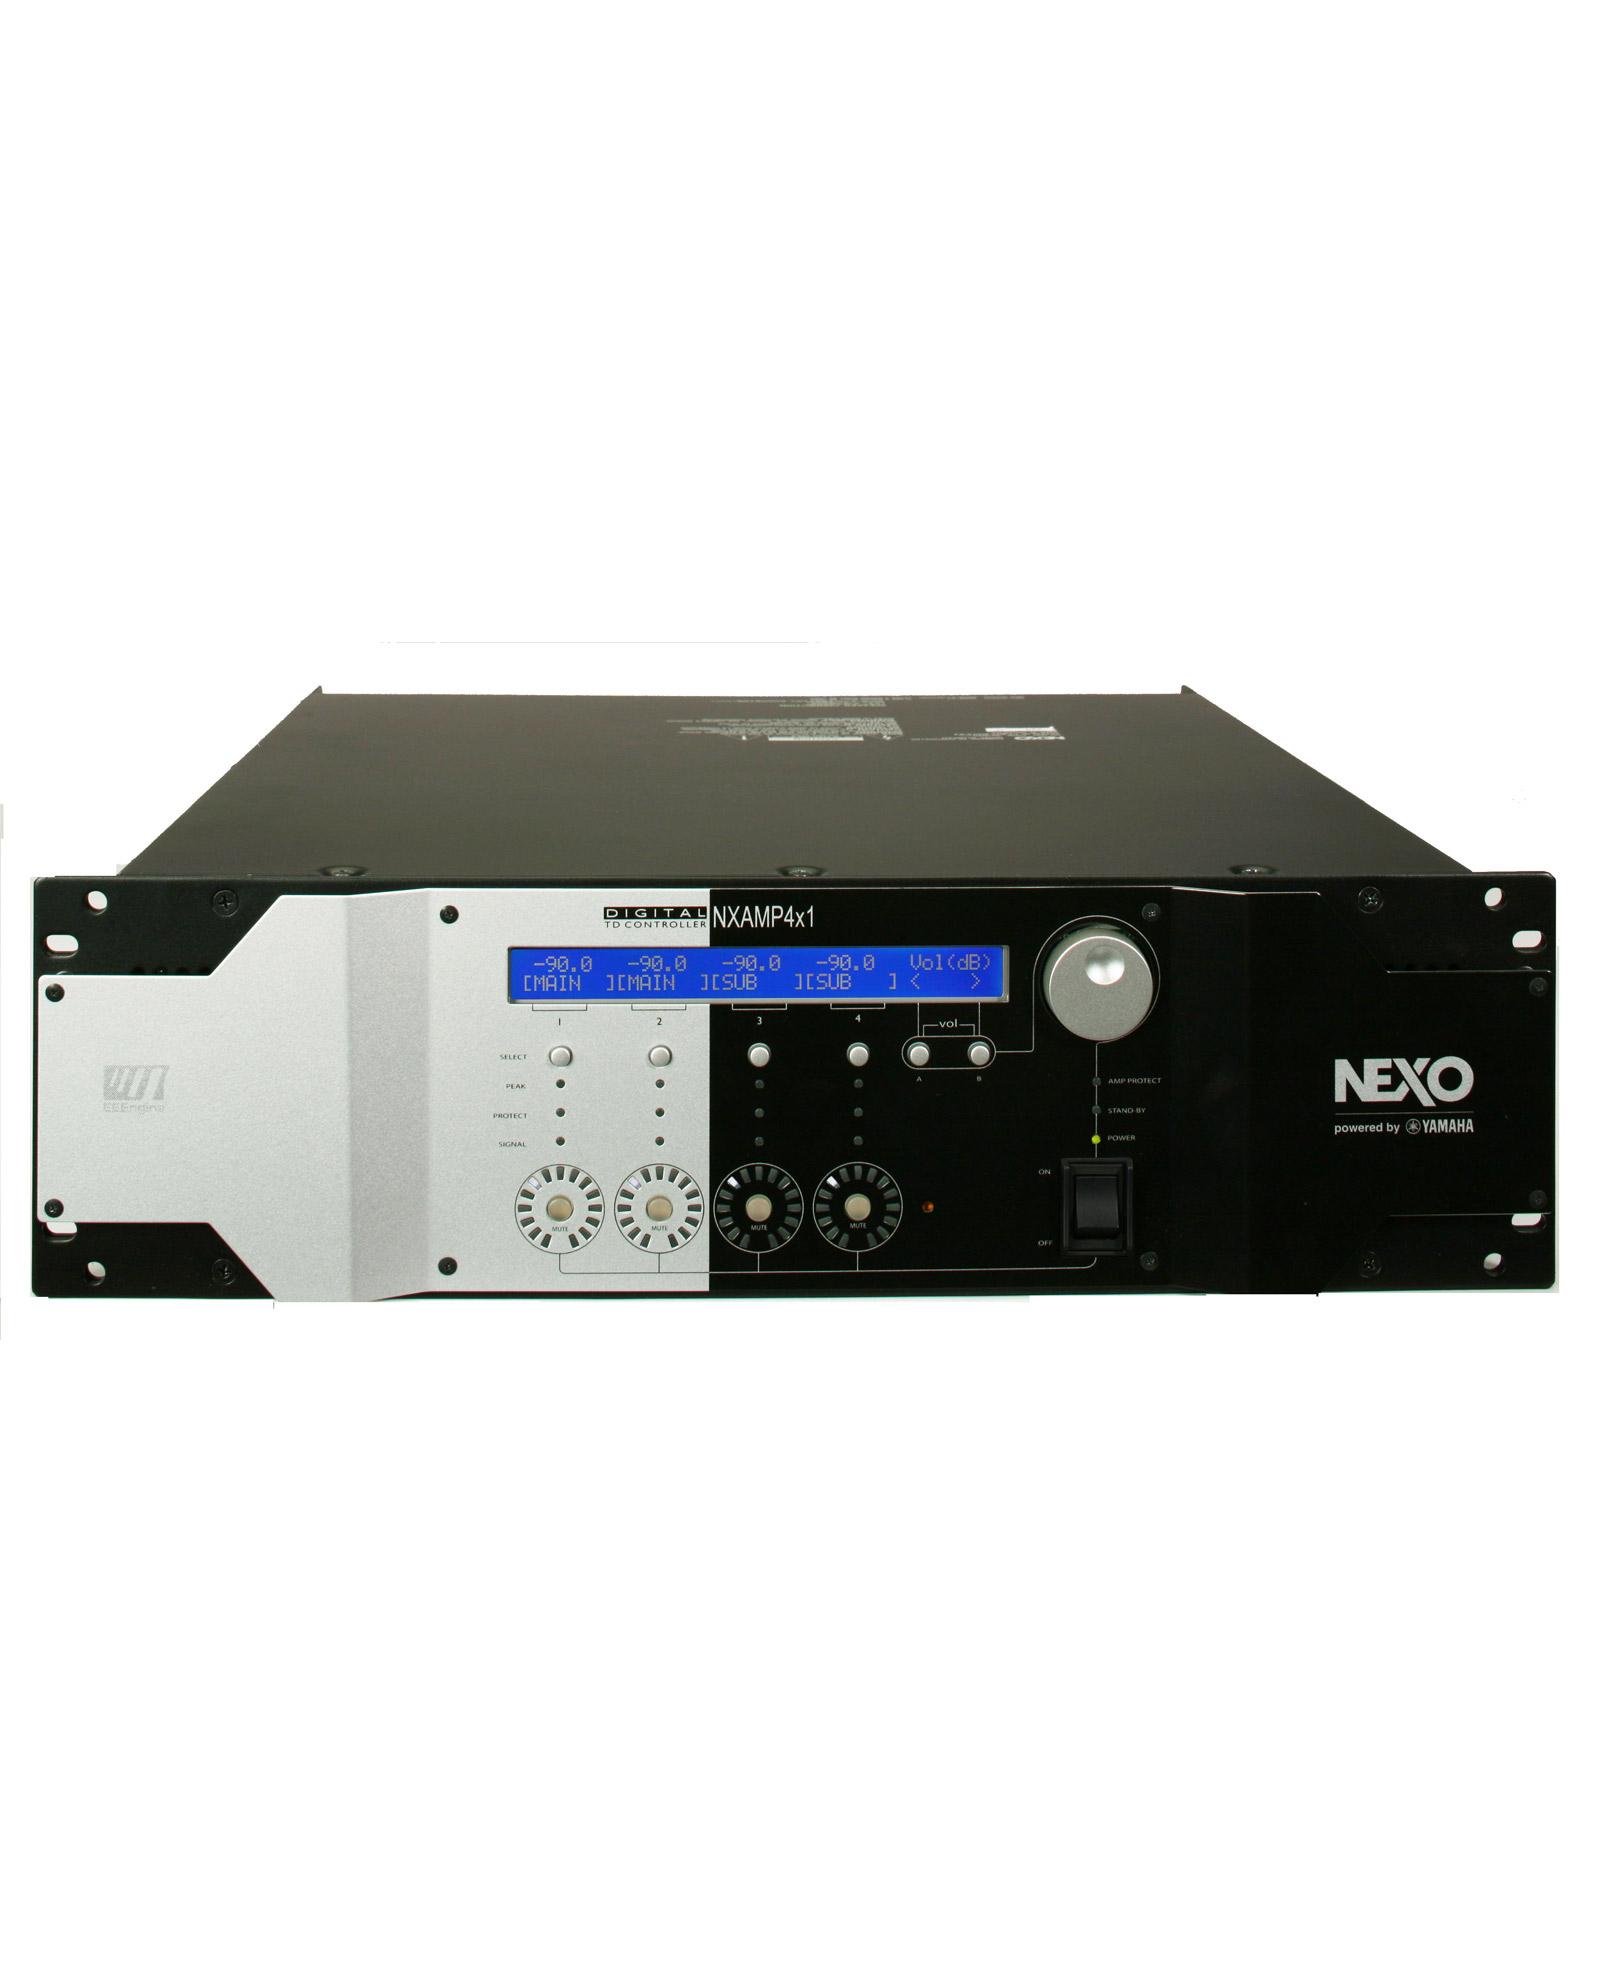 Nexo NXAMP4X1 Amplifier